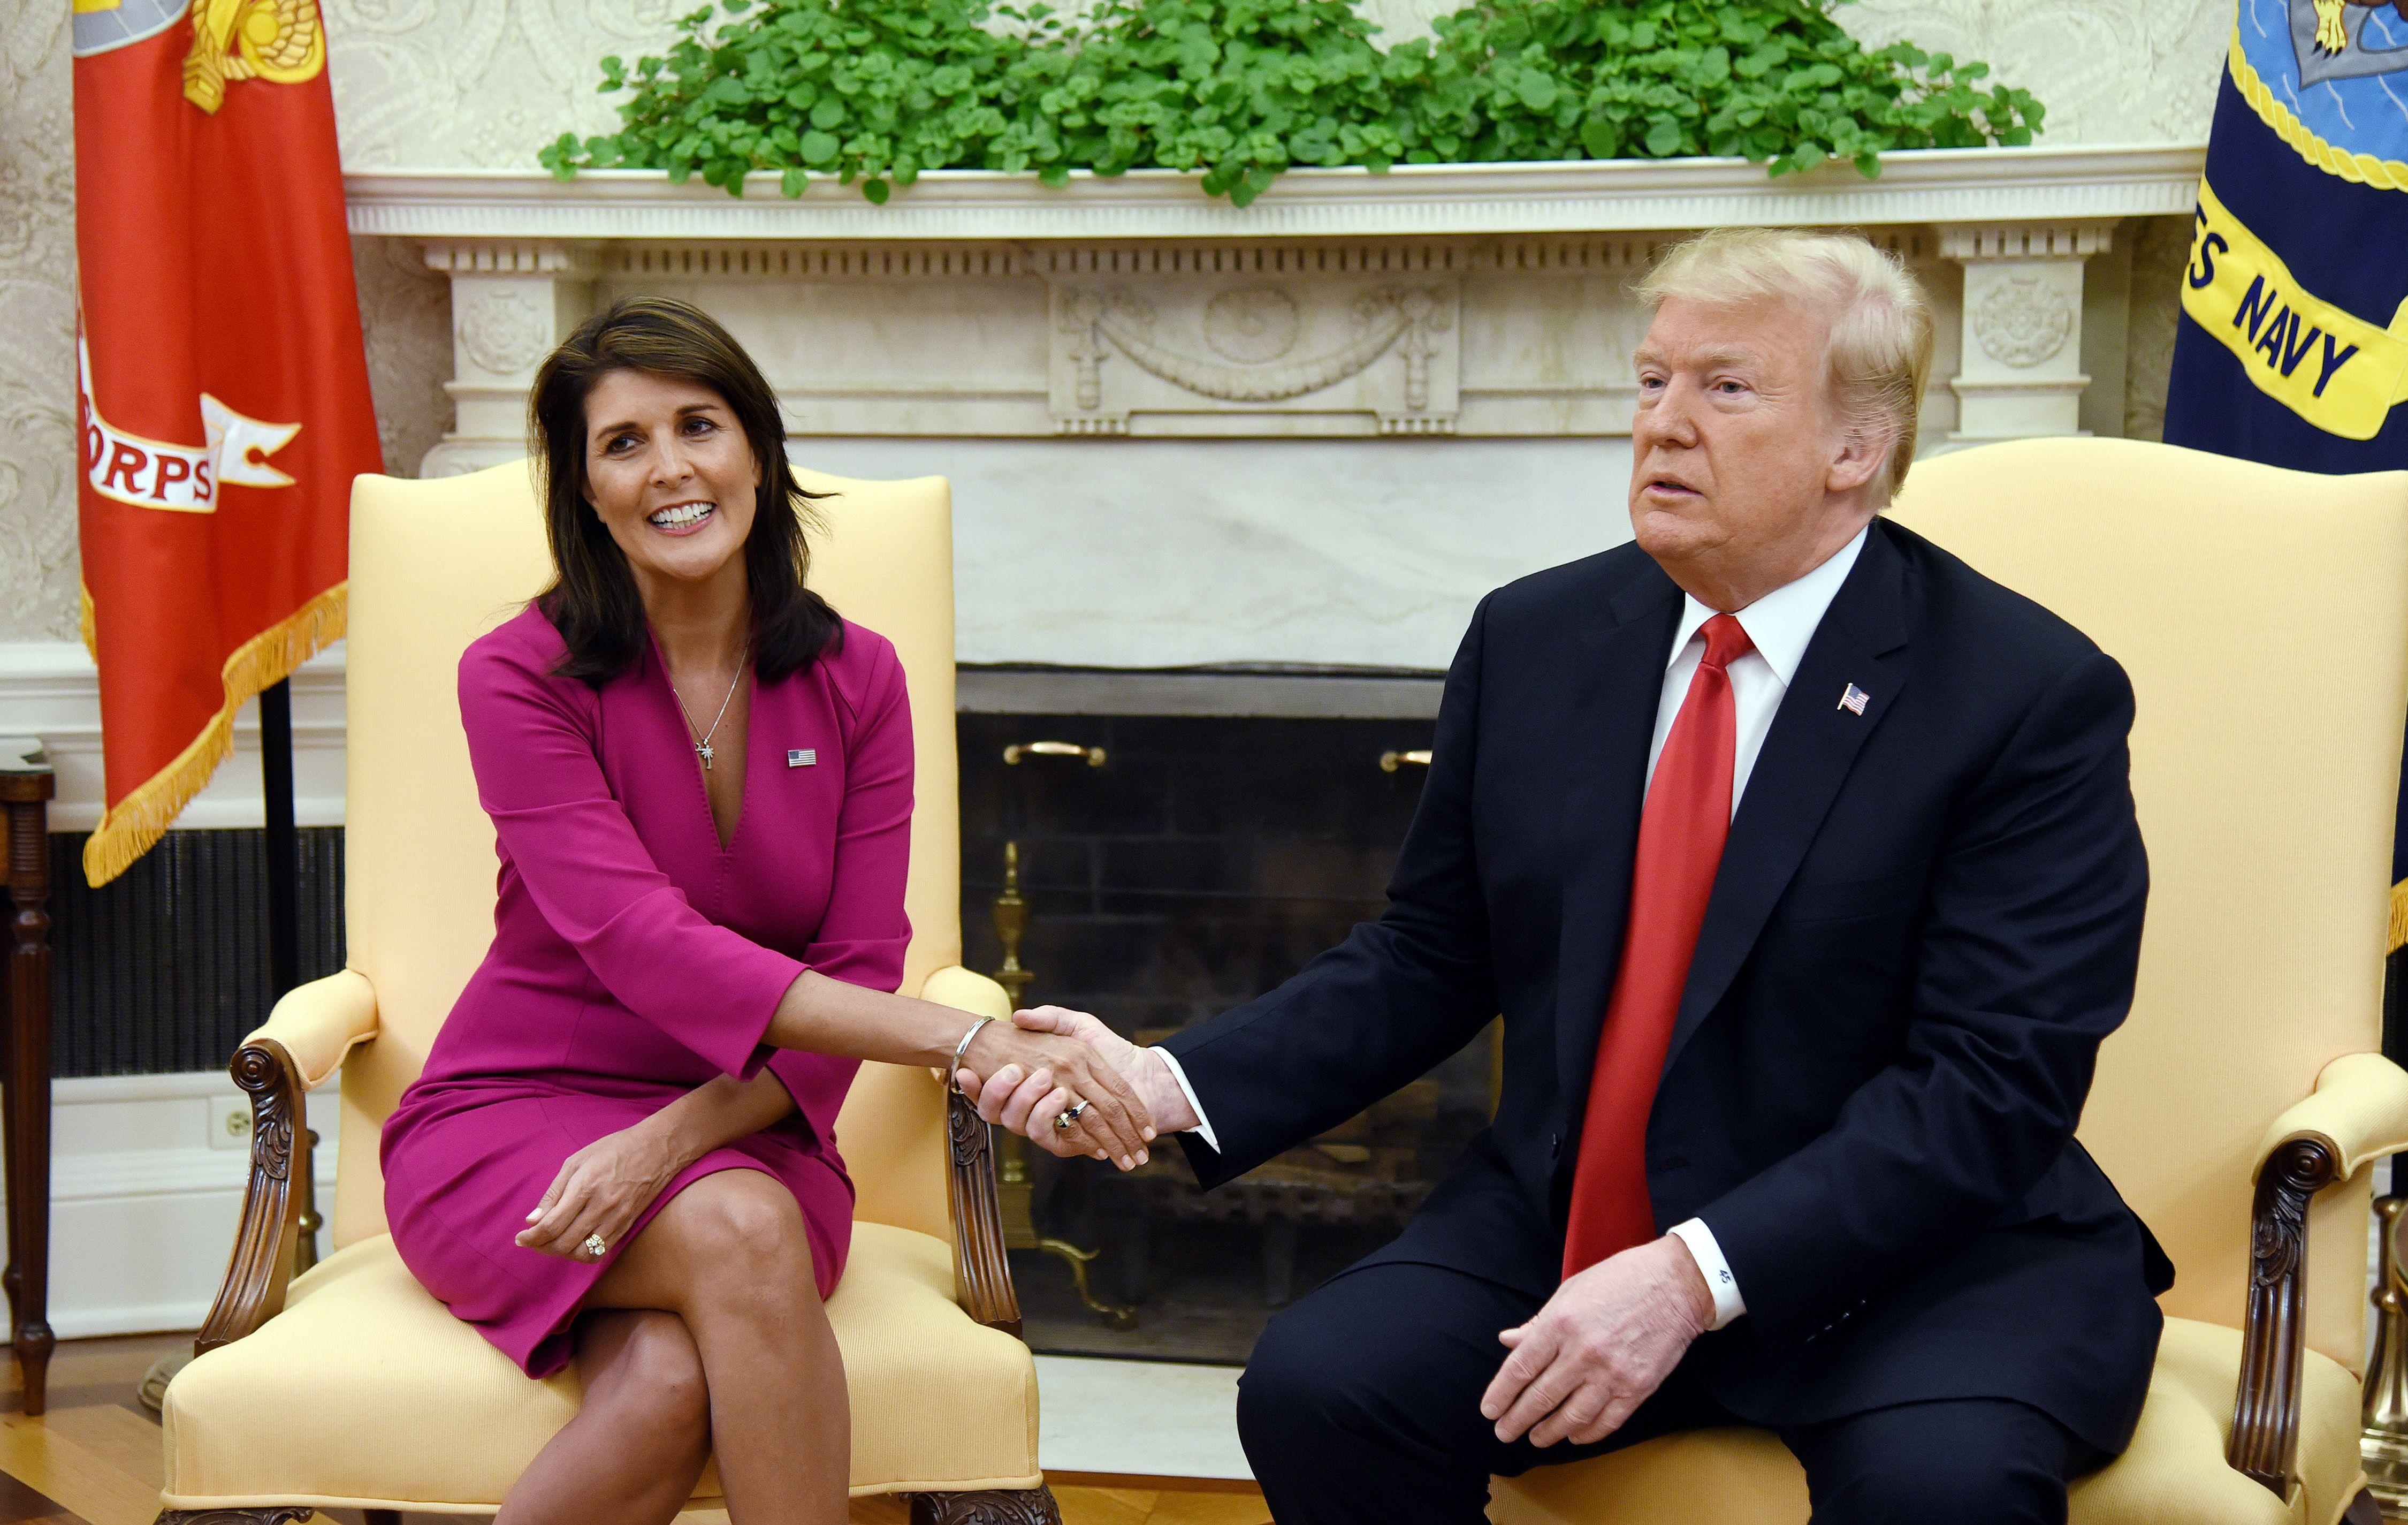 President Donald Trump shakes hands with Nikki Haley